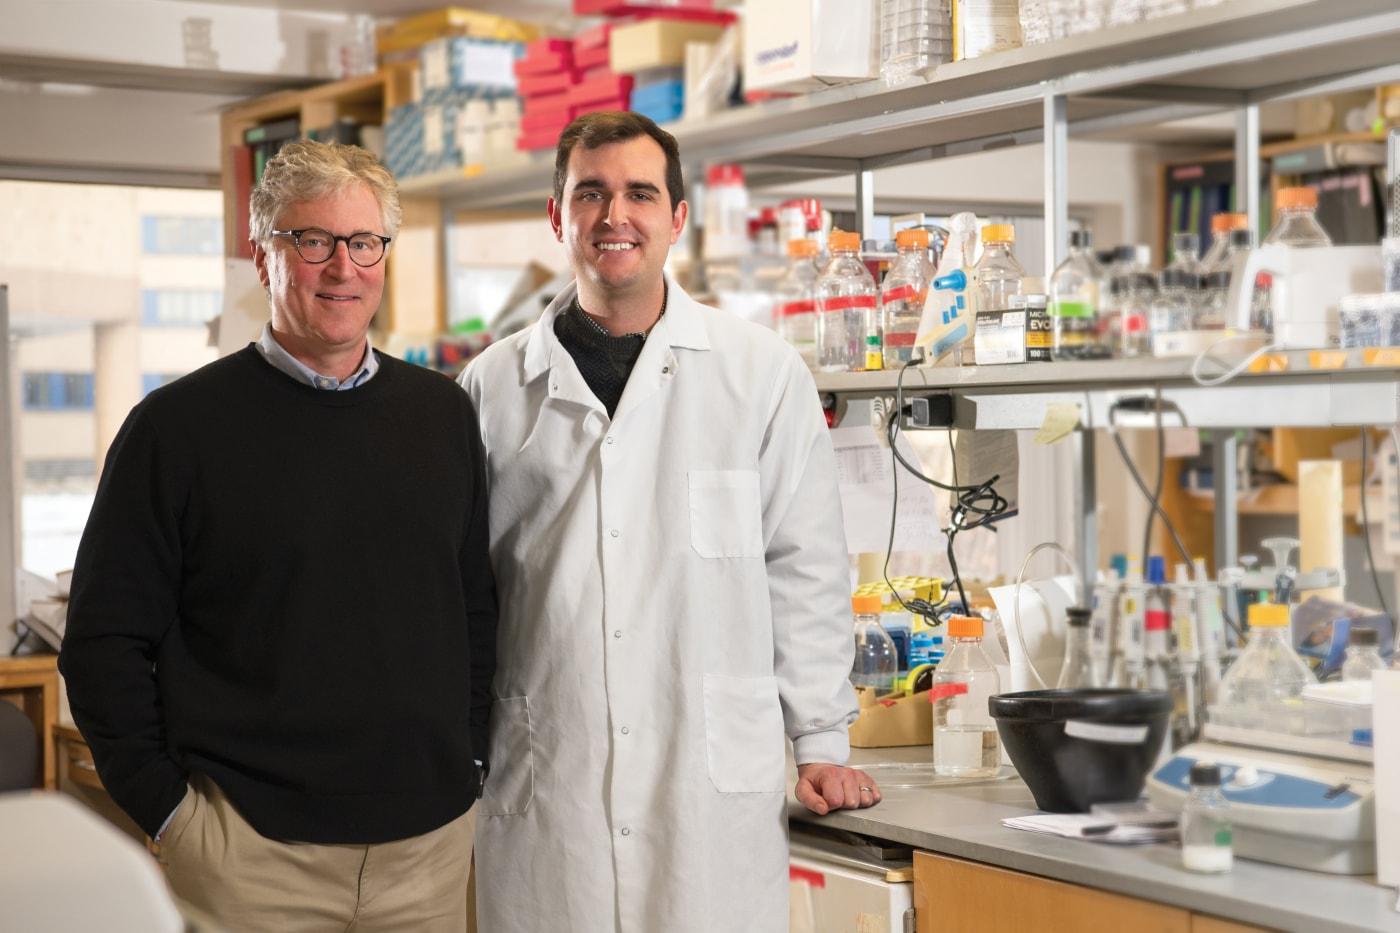 Peter Glazer, MD and Parker Sulkowski